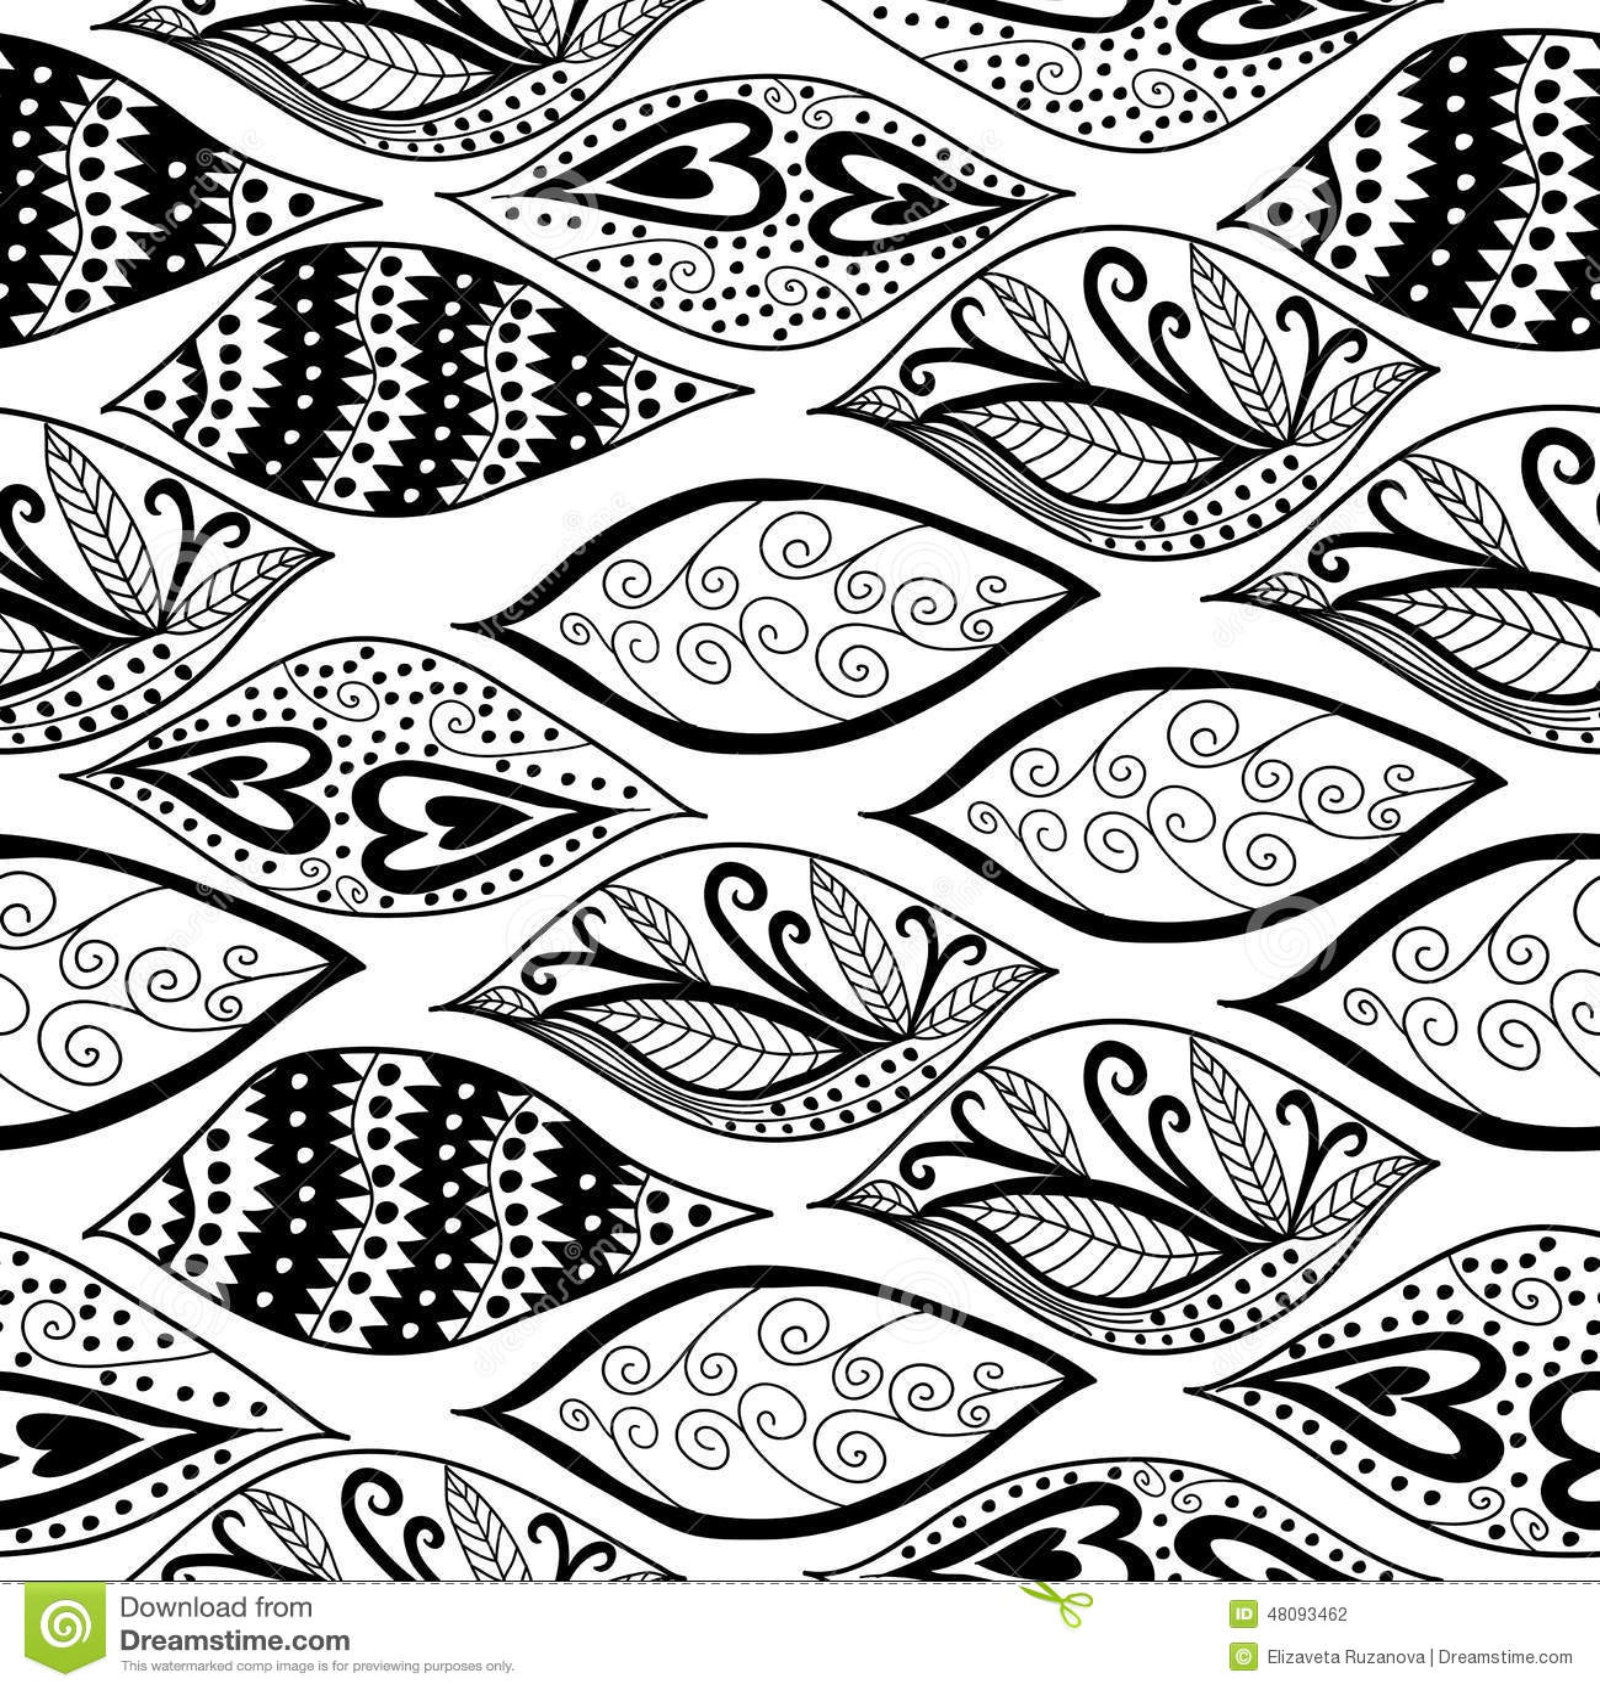 Black and white ornaments - Black Ornaments Pattern Seamless White